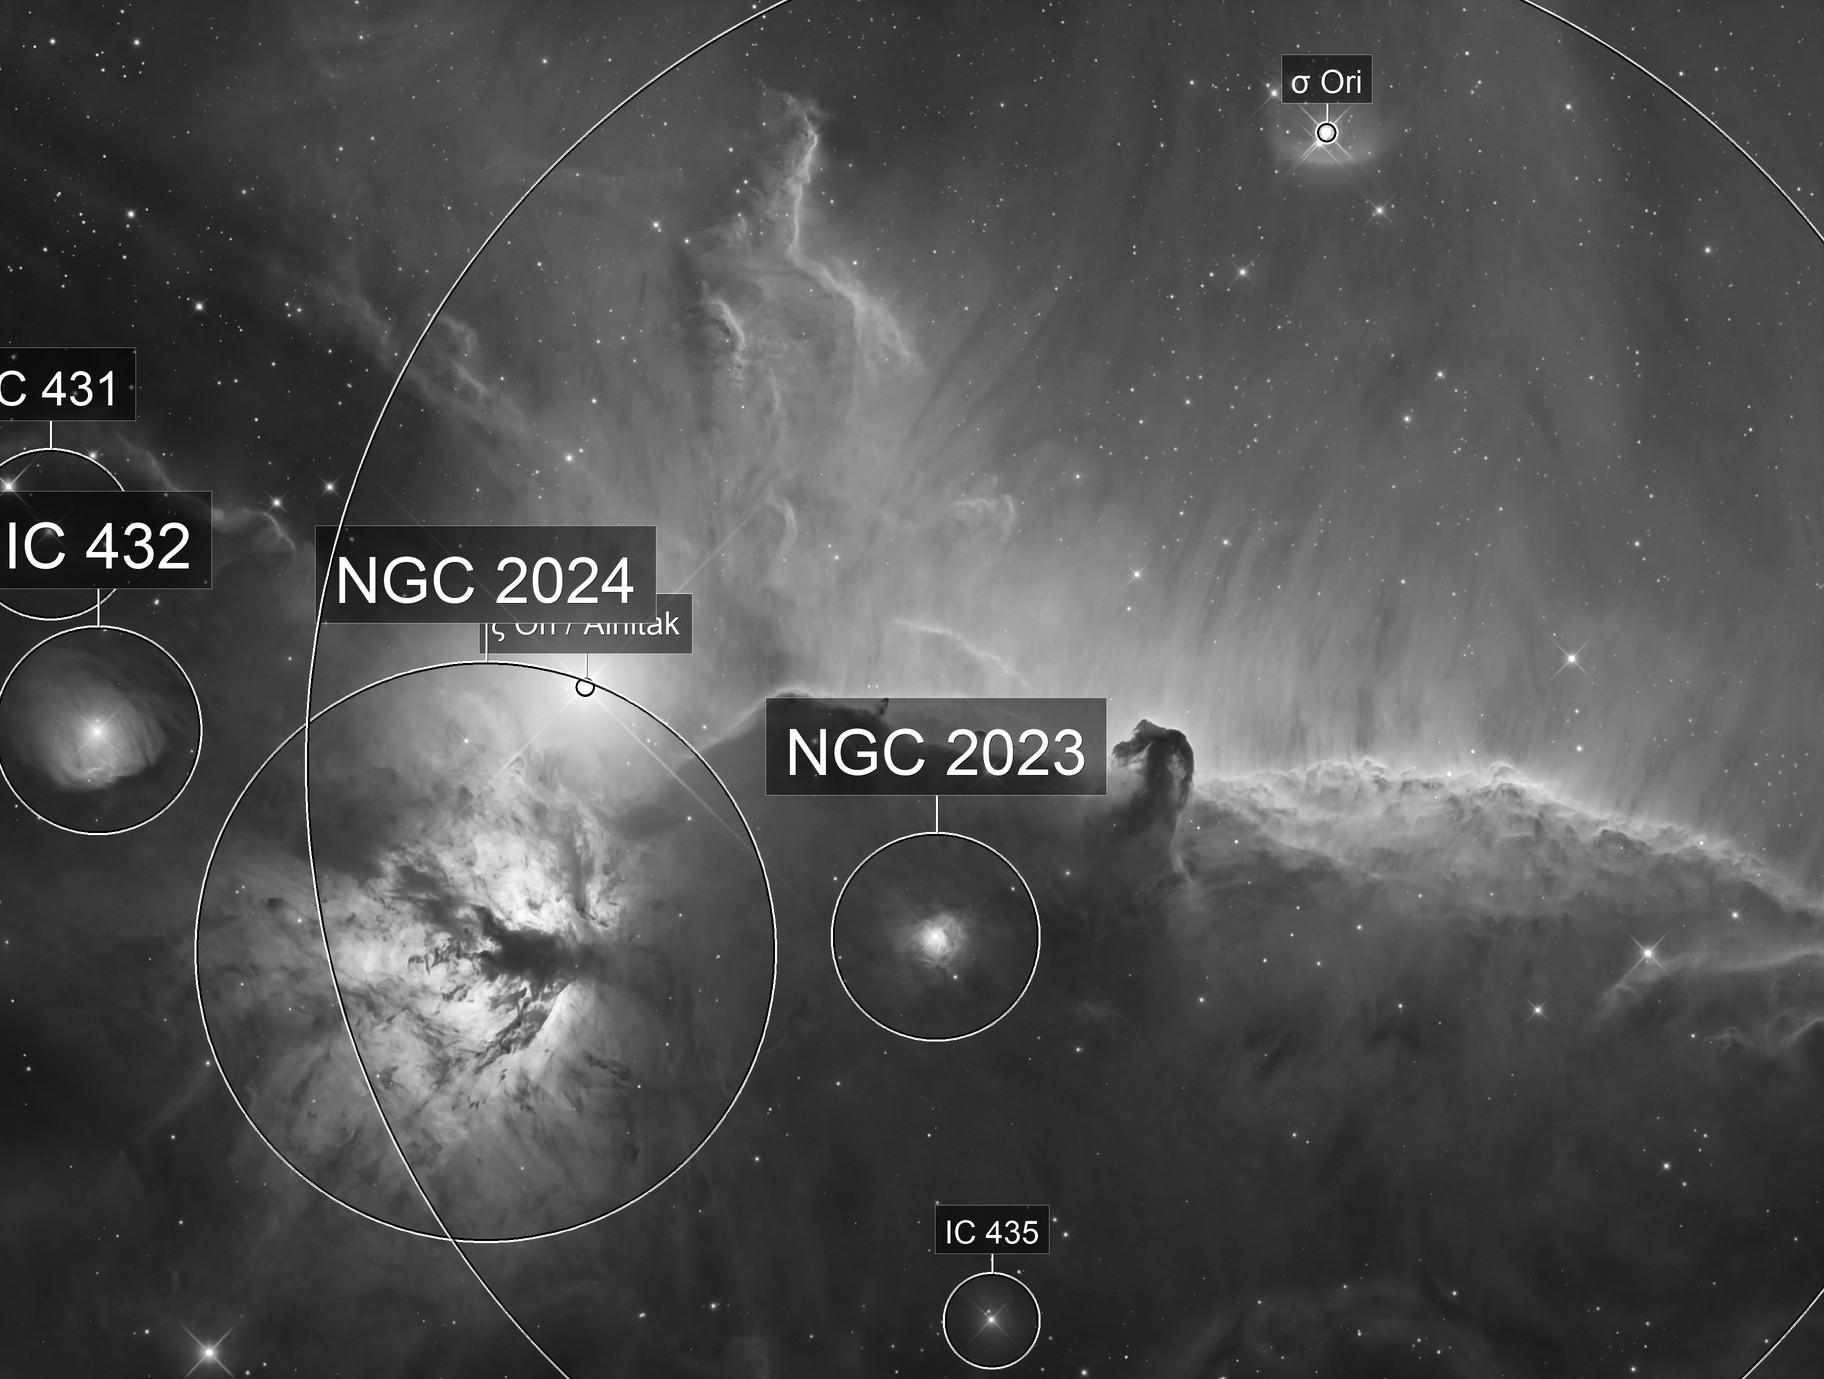 The Horsehead nebula, Barnard 33